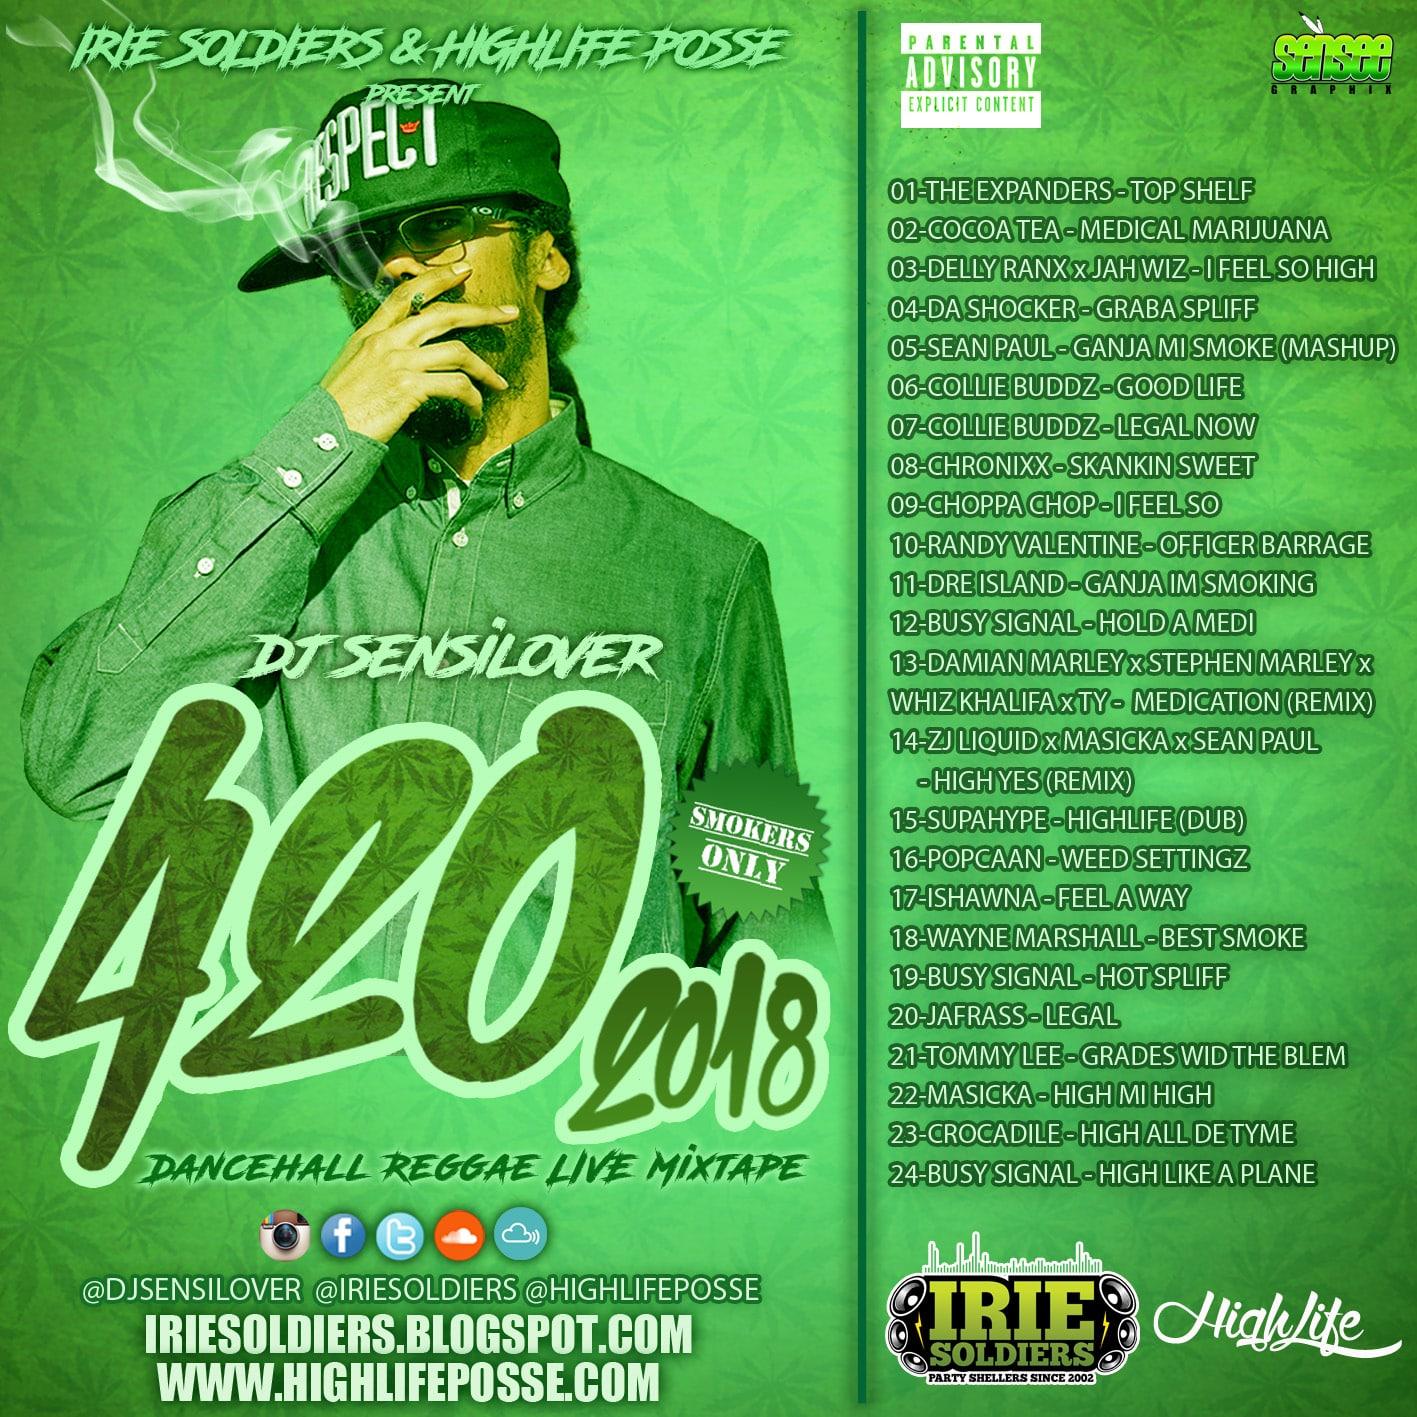 420 DANCEHALL REGGAE MIXTAPE 2018 - DJ SENSILOVER - HighLifePosse